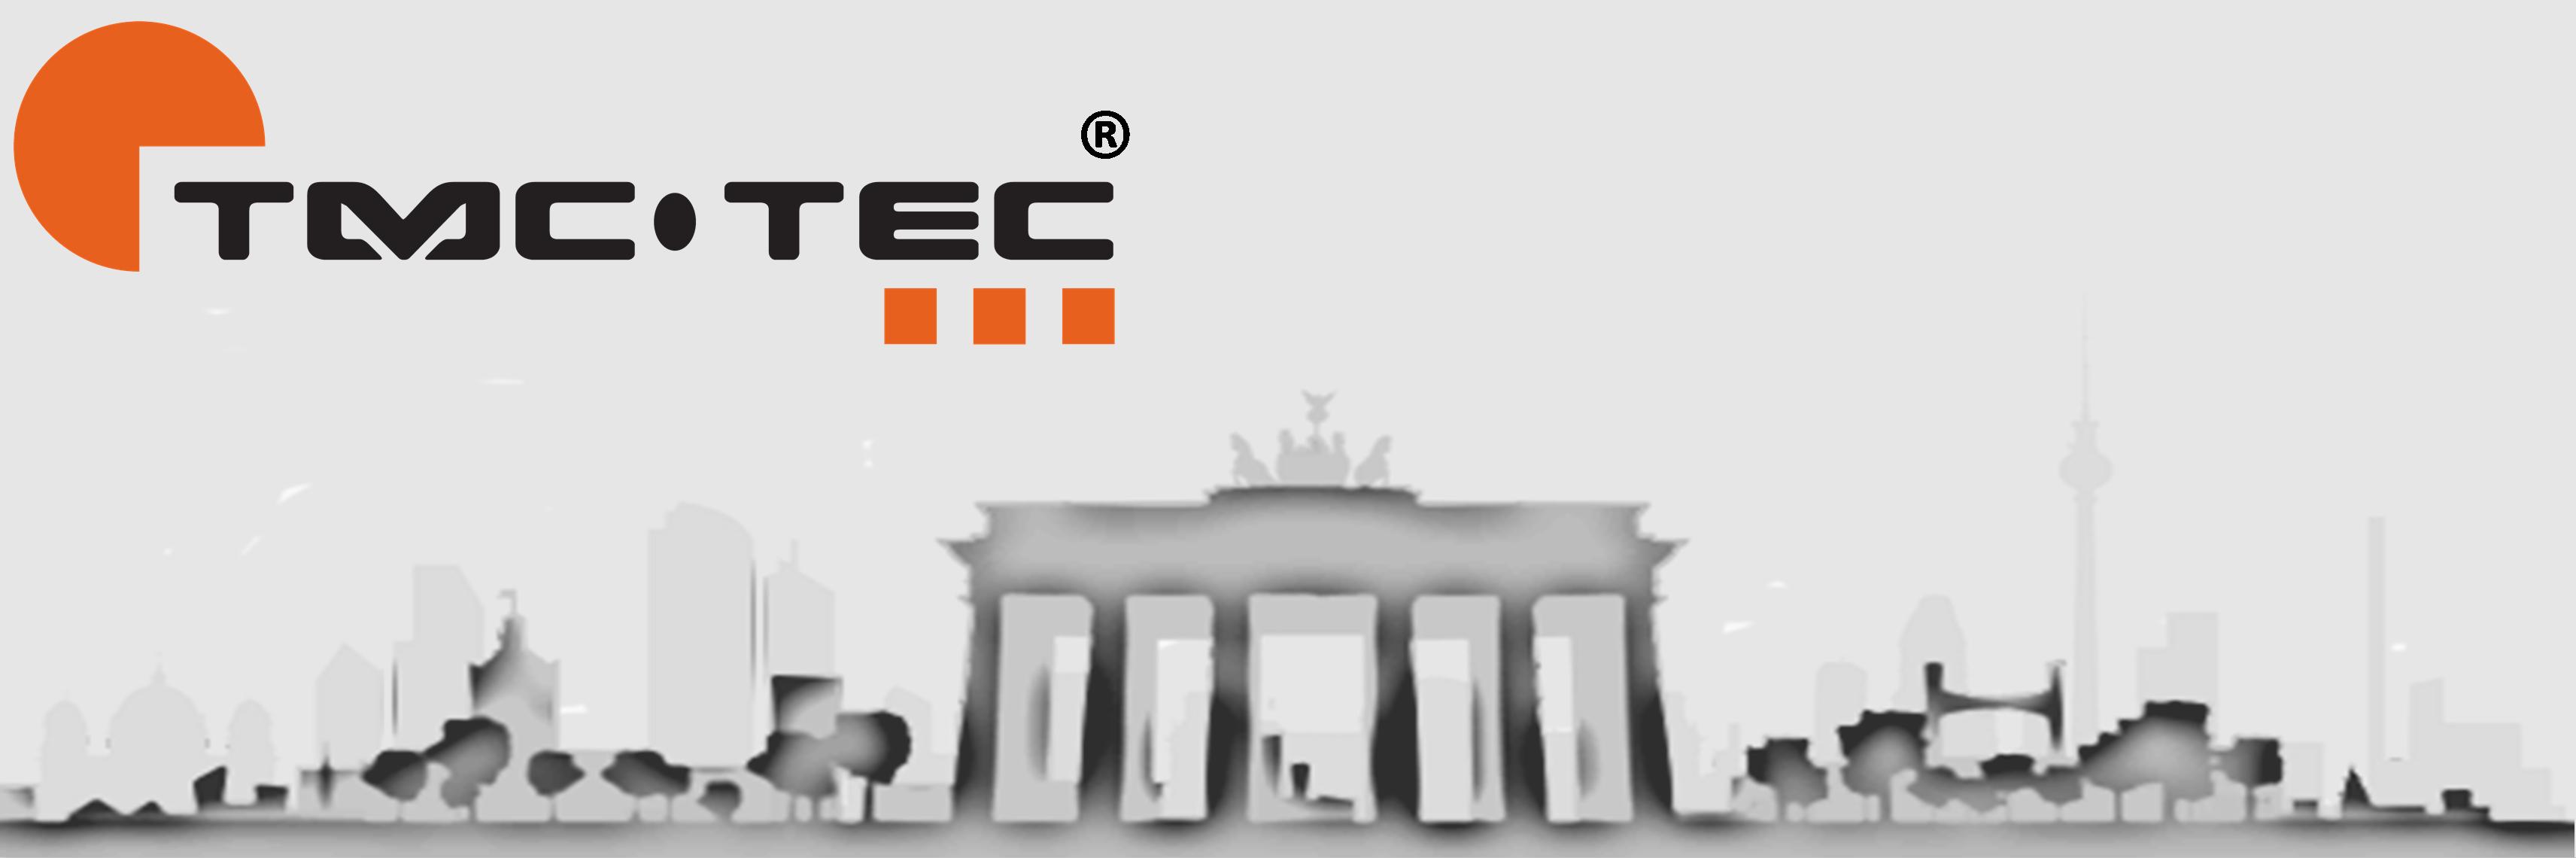 TMC-TEC Reparaturservice Logo-Header